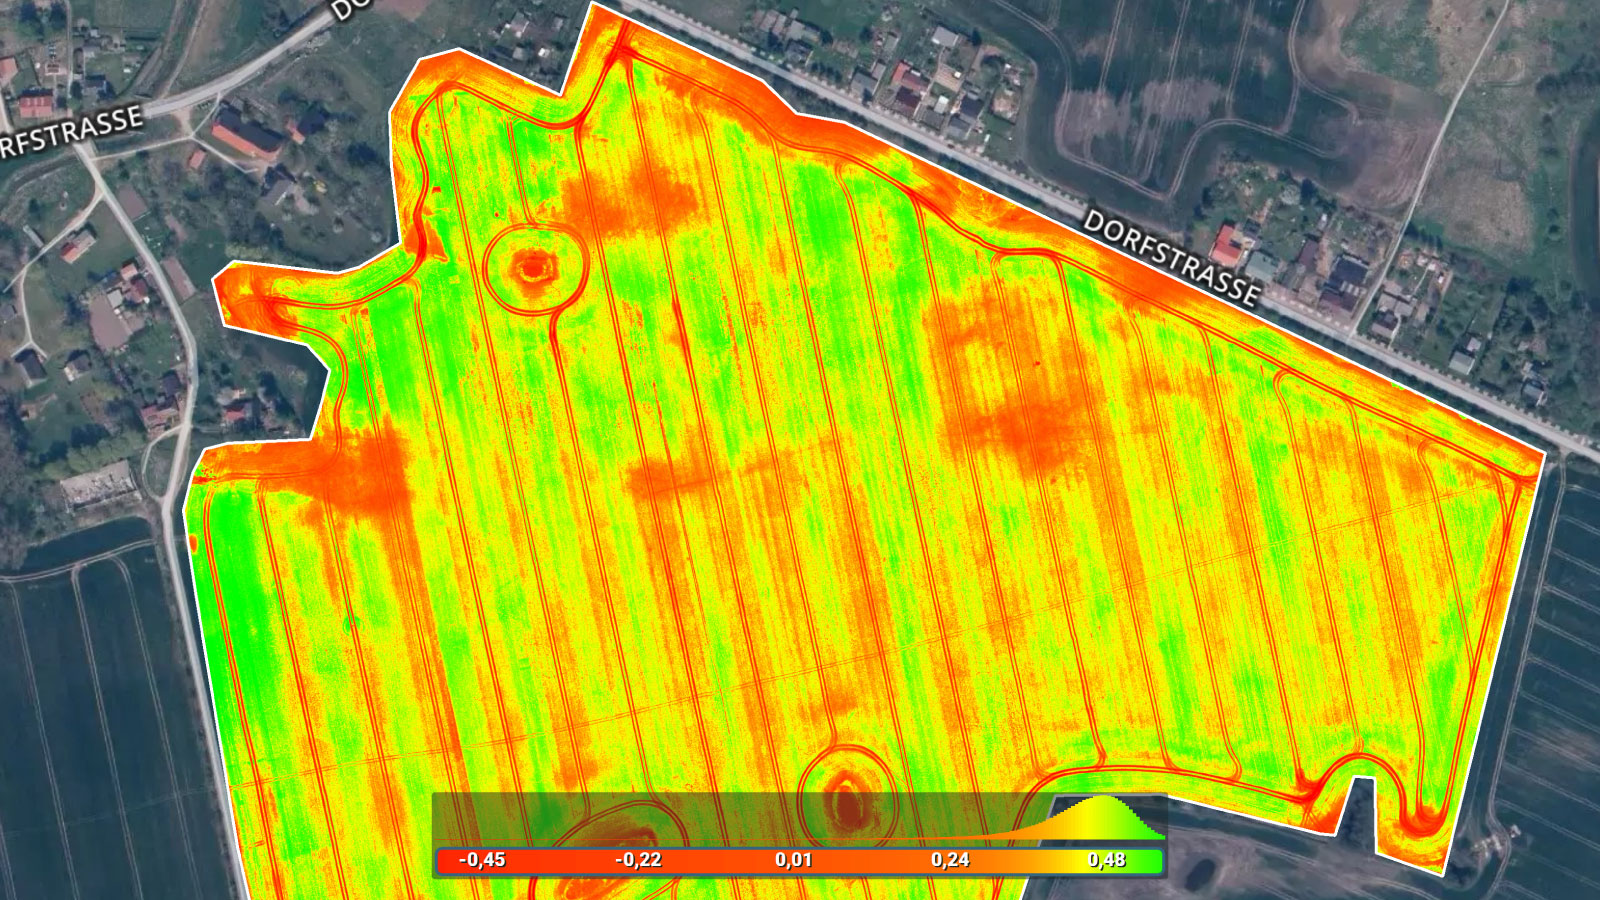 IMAGE OUTPUTS PIX4DFIELDS vegetation index map